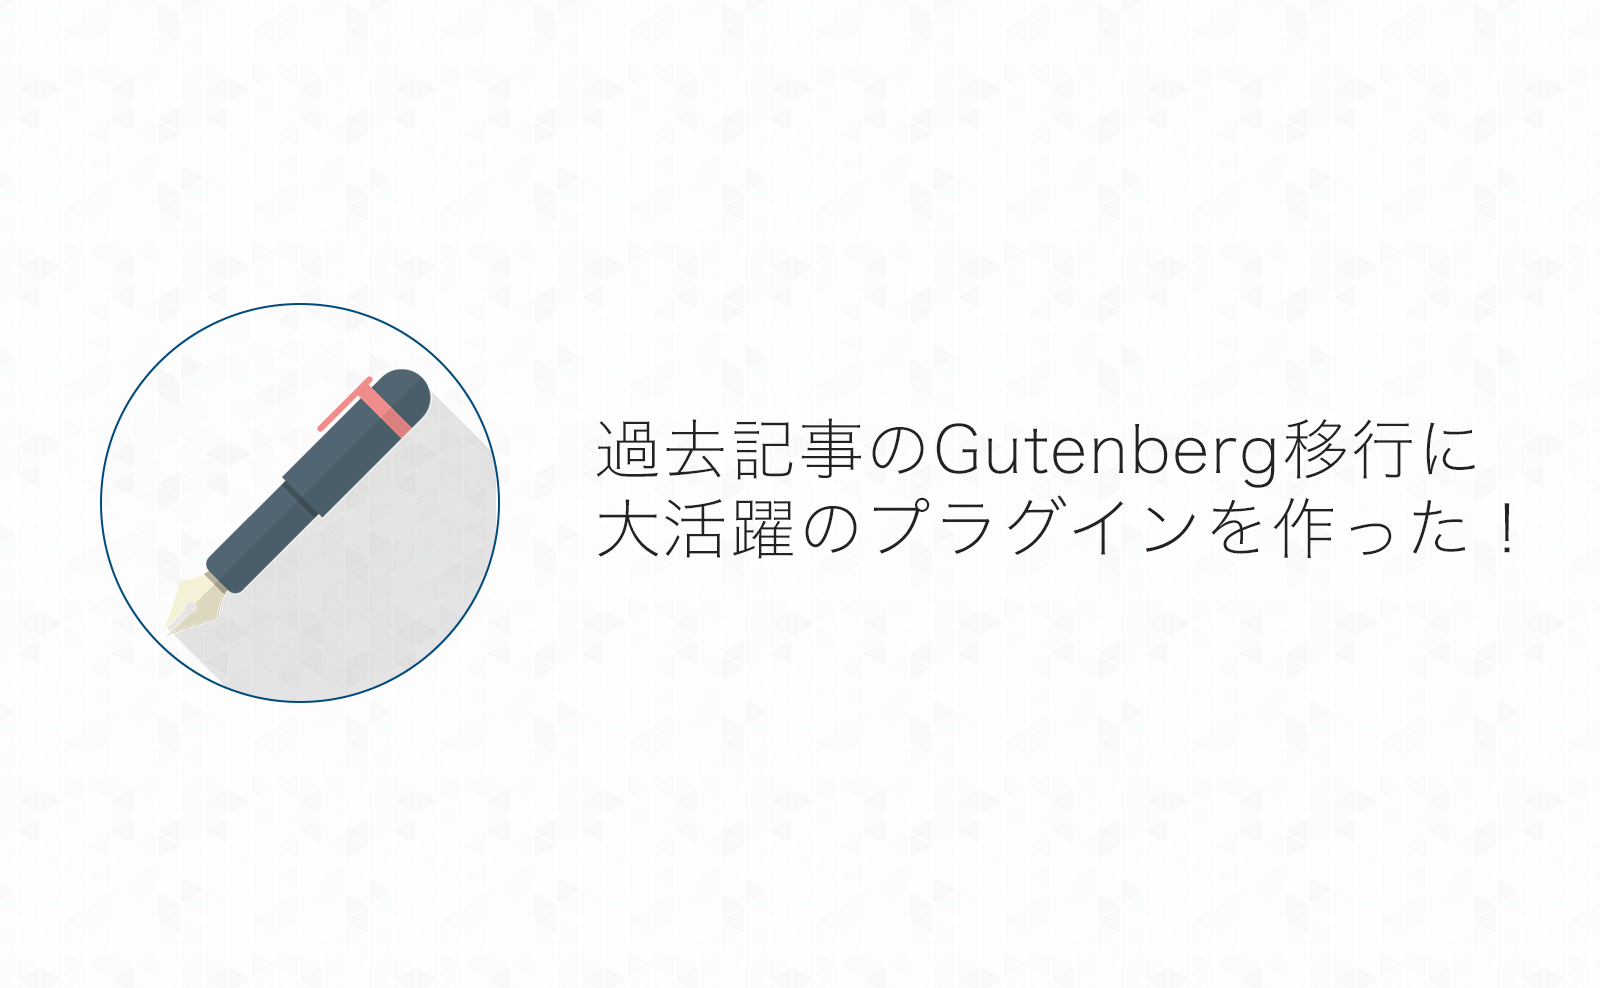 【WordPress】過去記事のGutenberg移行に大活躍!記事毎にブロックエディターを有効化するプラグイン